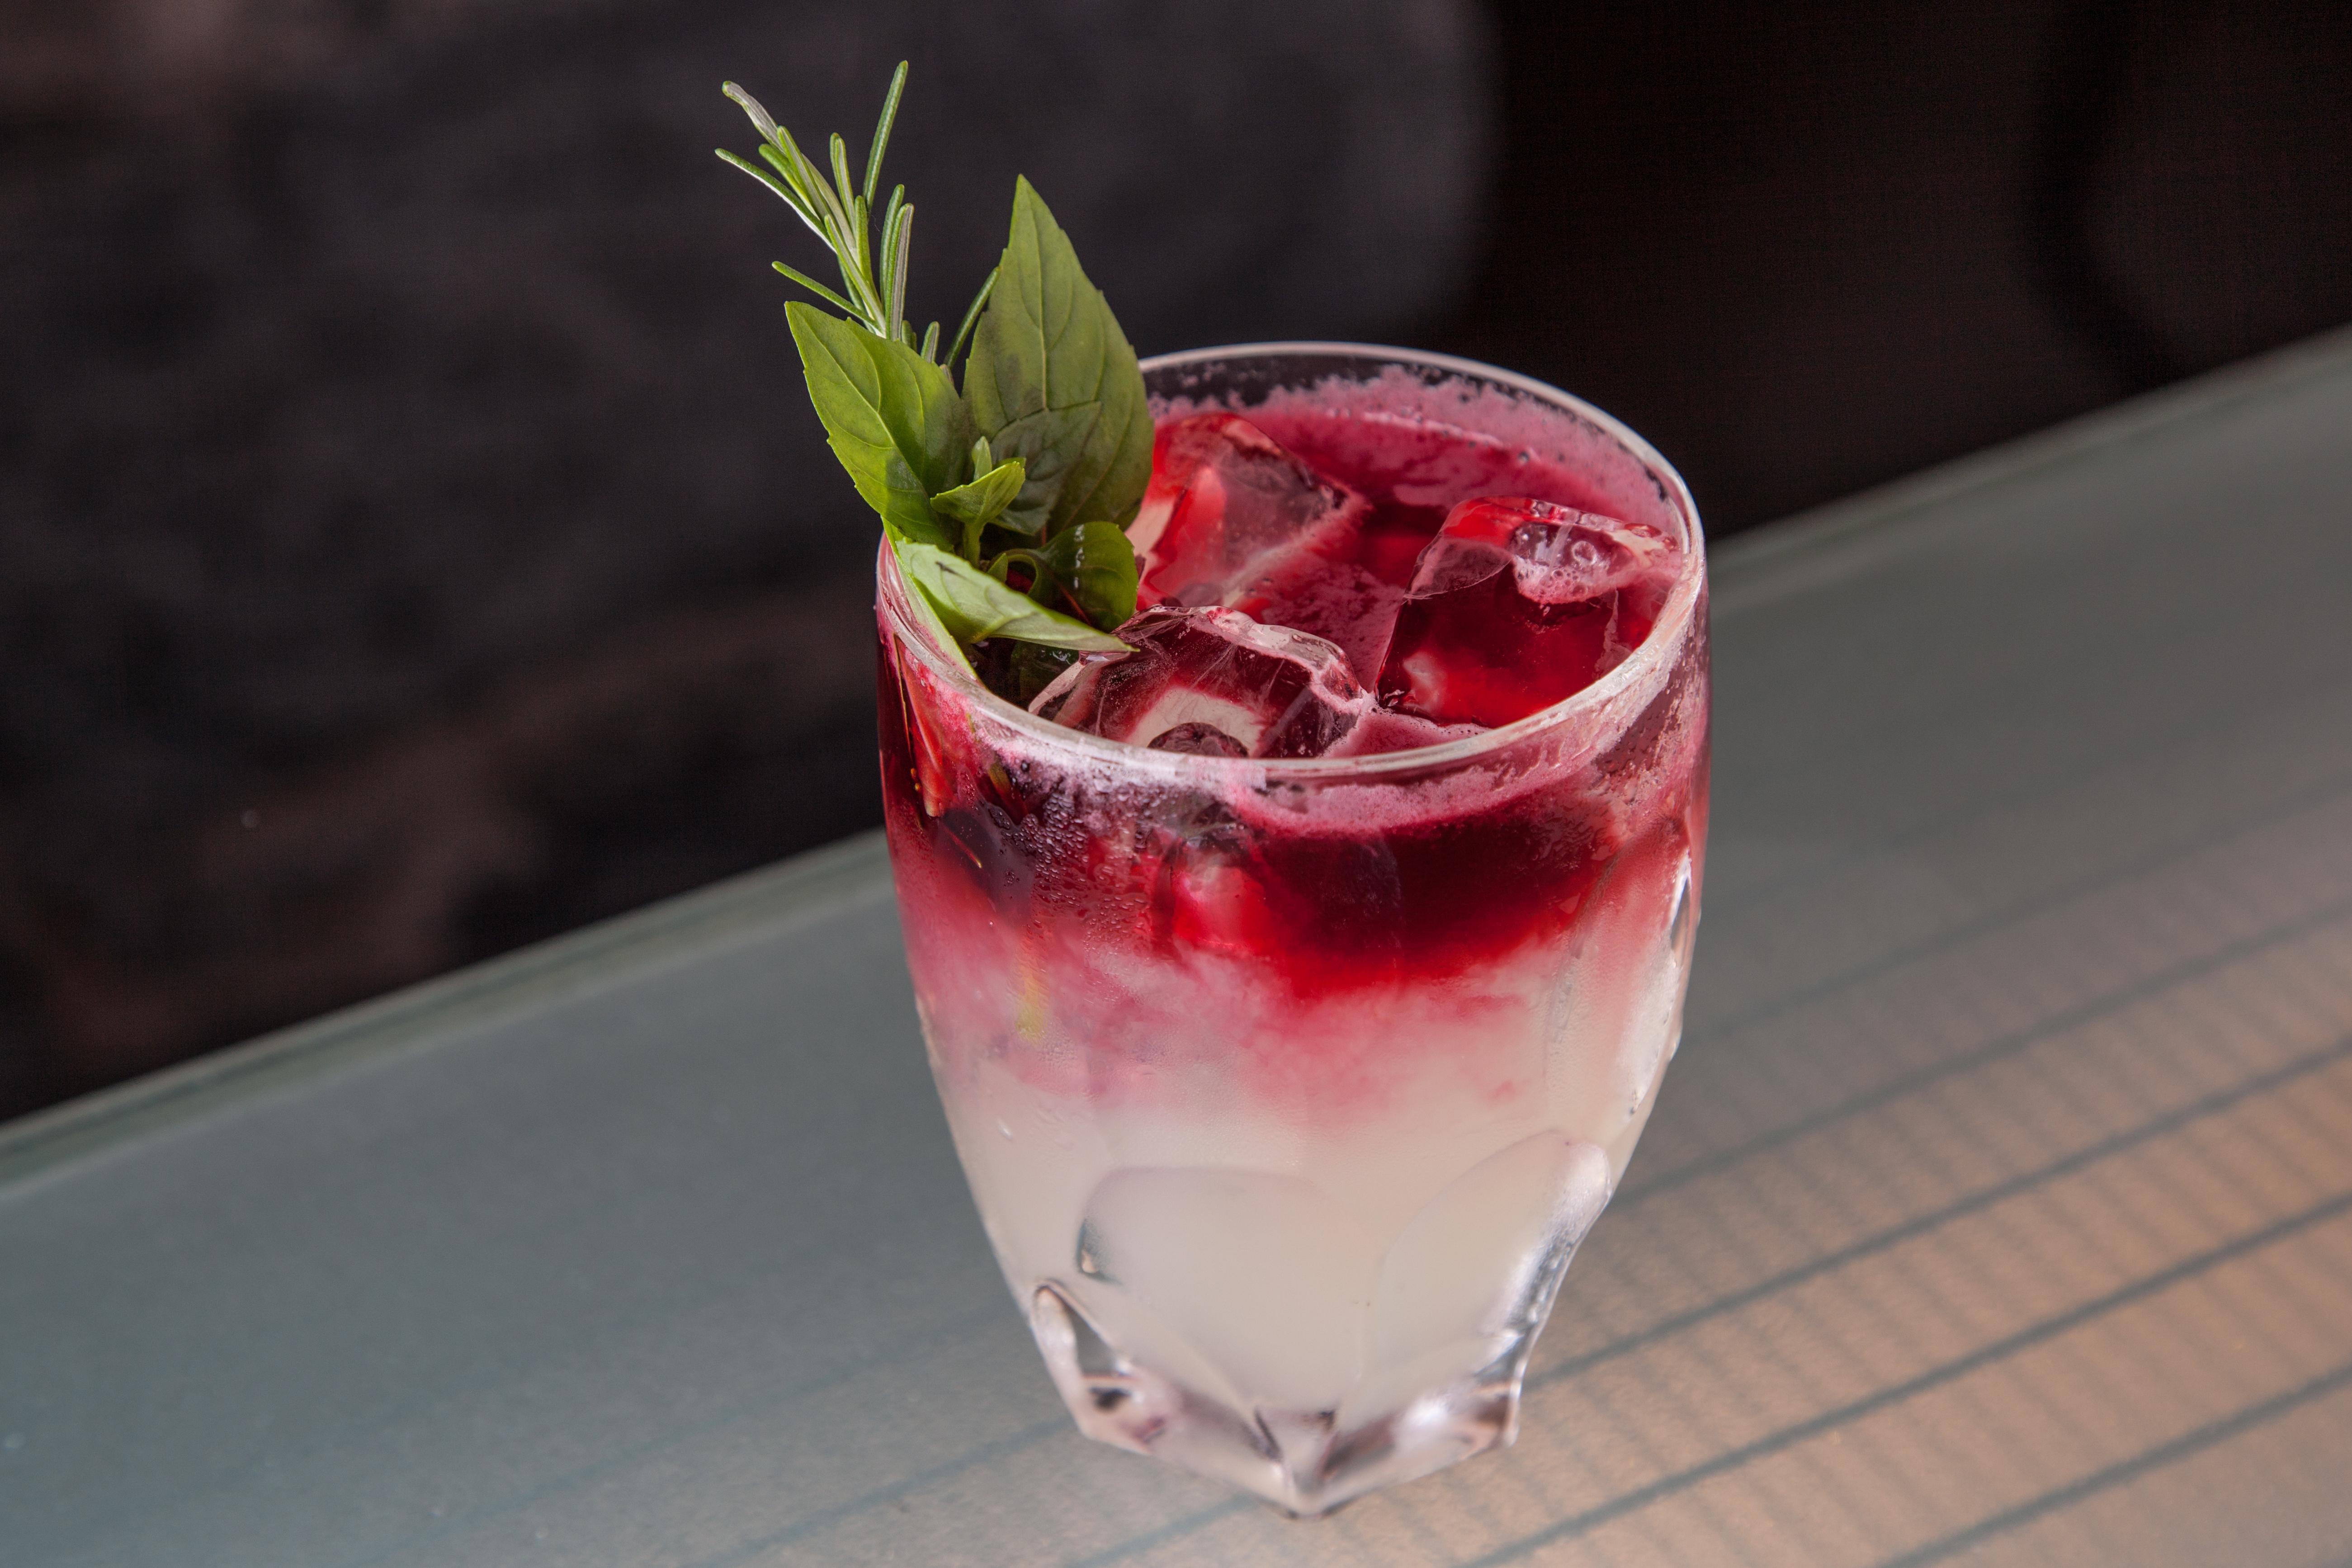 Tosca: drinque autoral da argentina Chula, combina tequila, licor de laranja, gengibre, limão-taiti, soda de hibisco e raspa de laranja